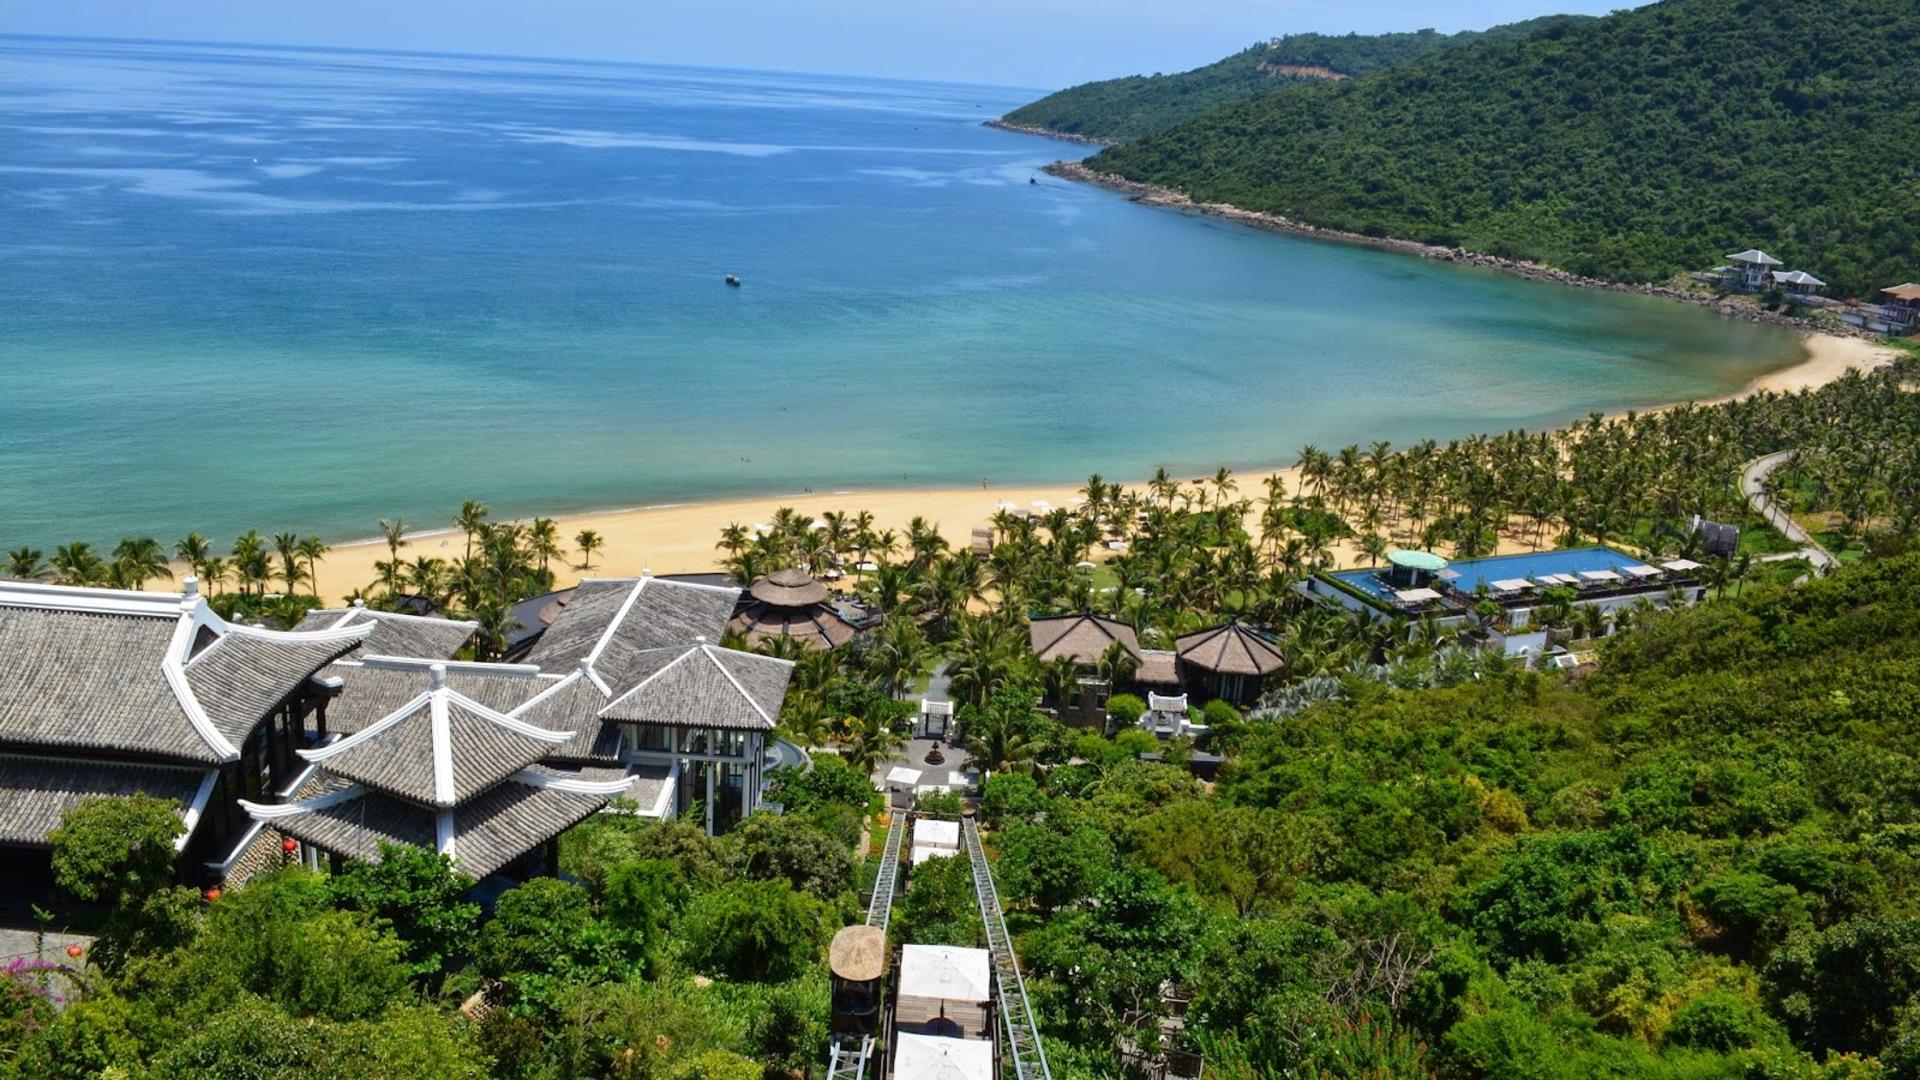 Фото курорта Дананг во Вьетнаме